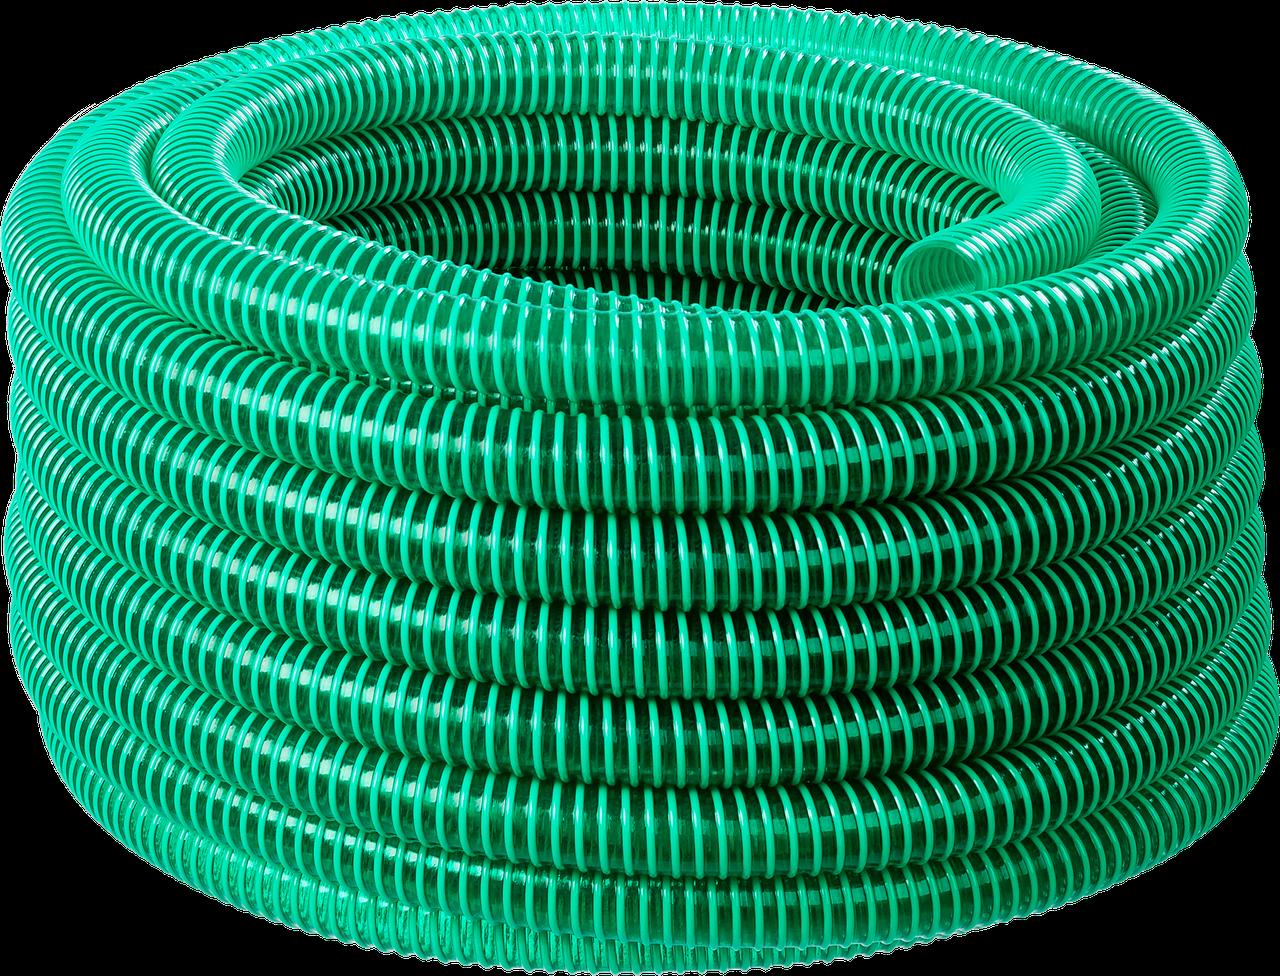 ЗУБР Шланг напорно-всасывающий со спиралью ПВХ, 3 атм, 19мм х 15м 360, 38, 15